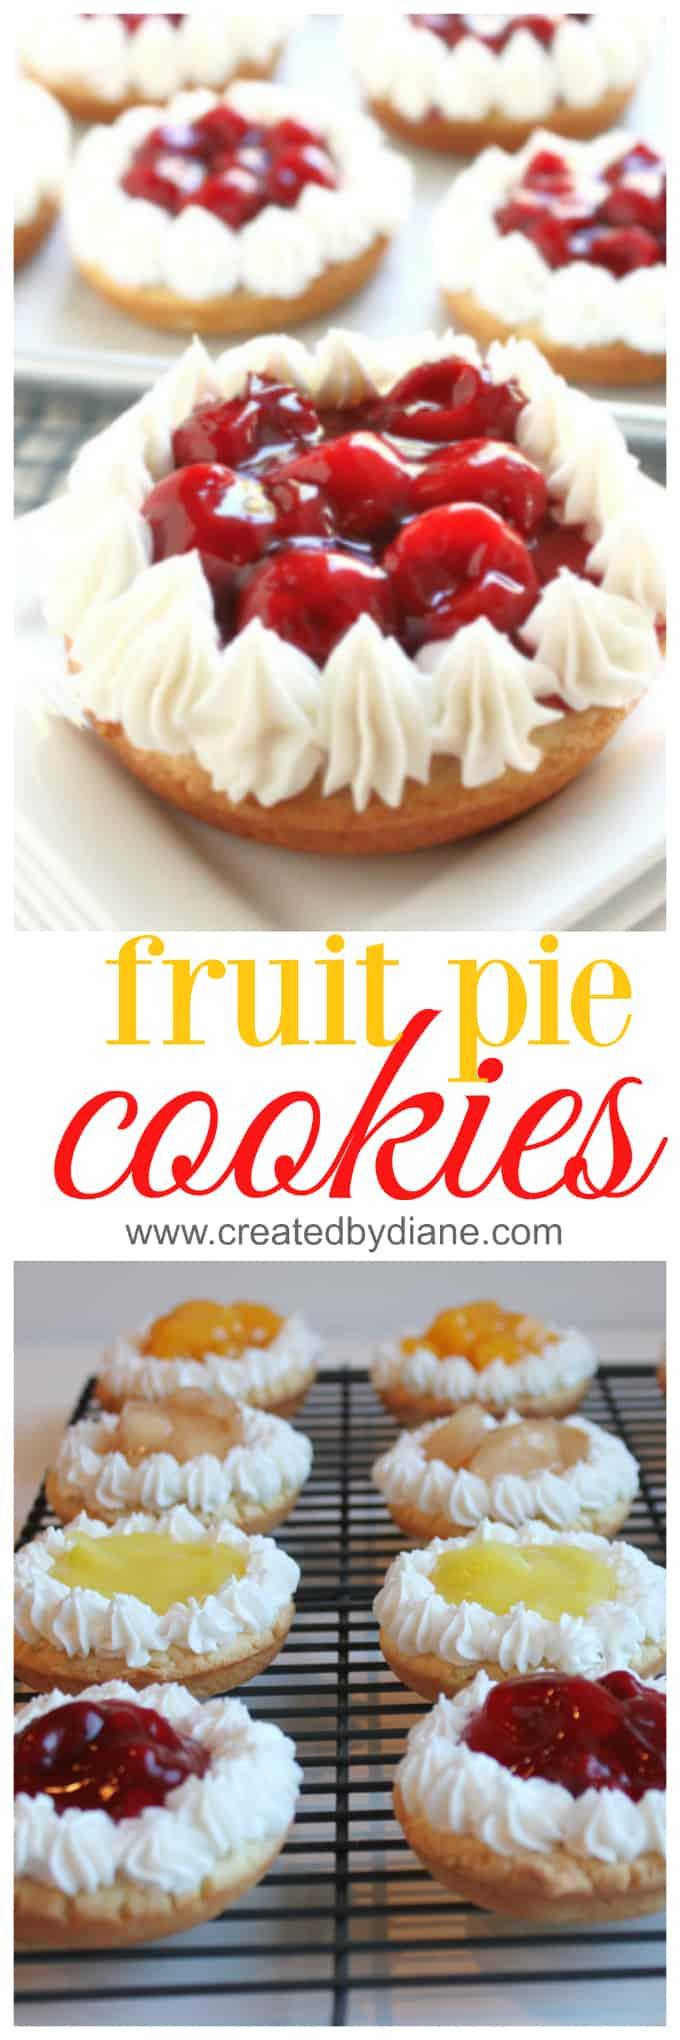 fruit pie cookies www.createdbydiane.com